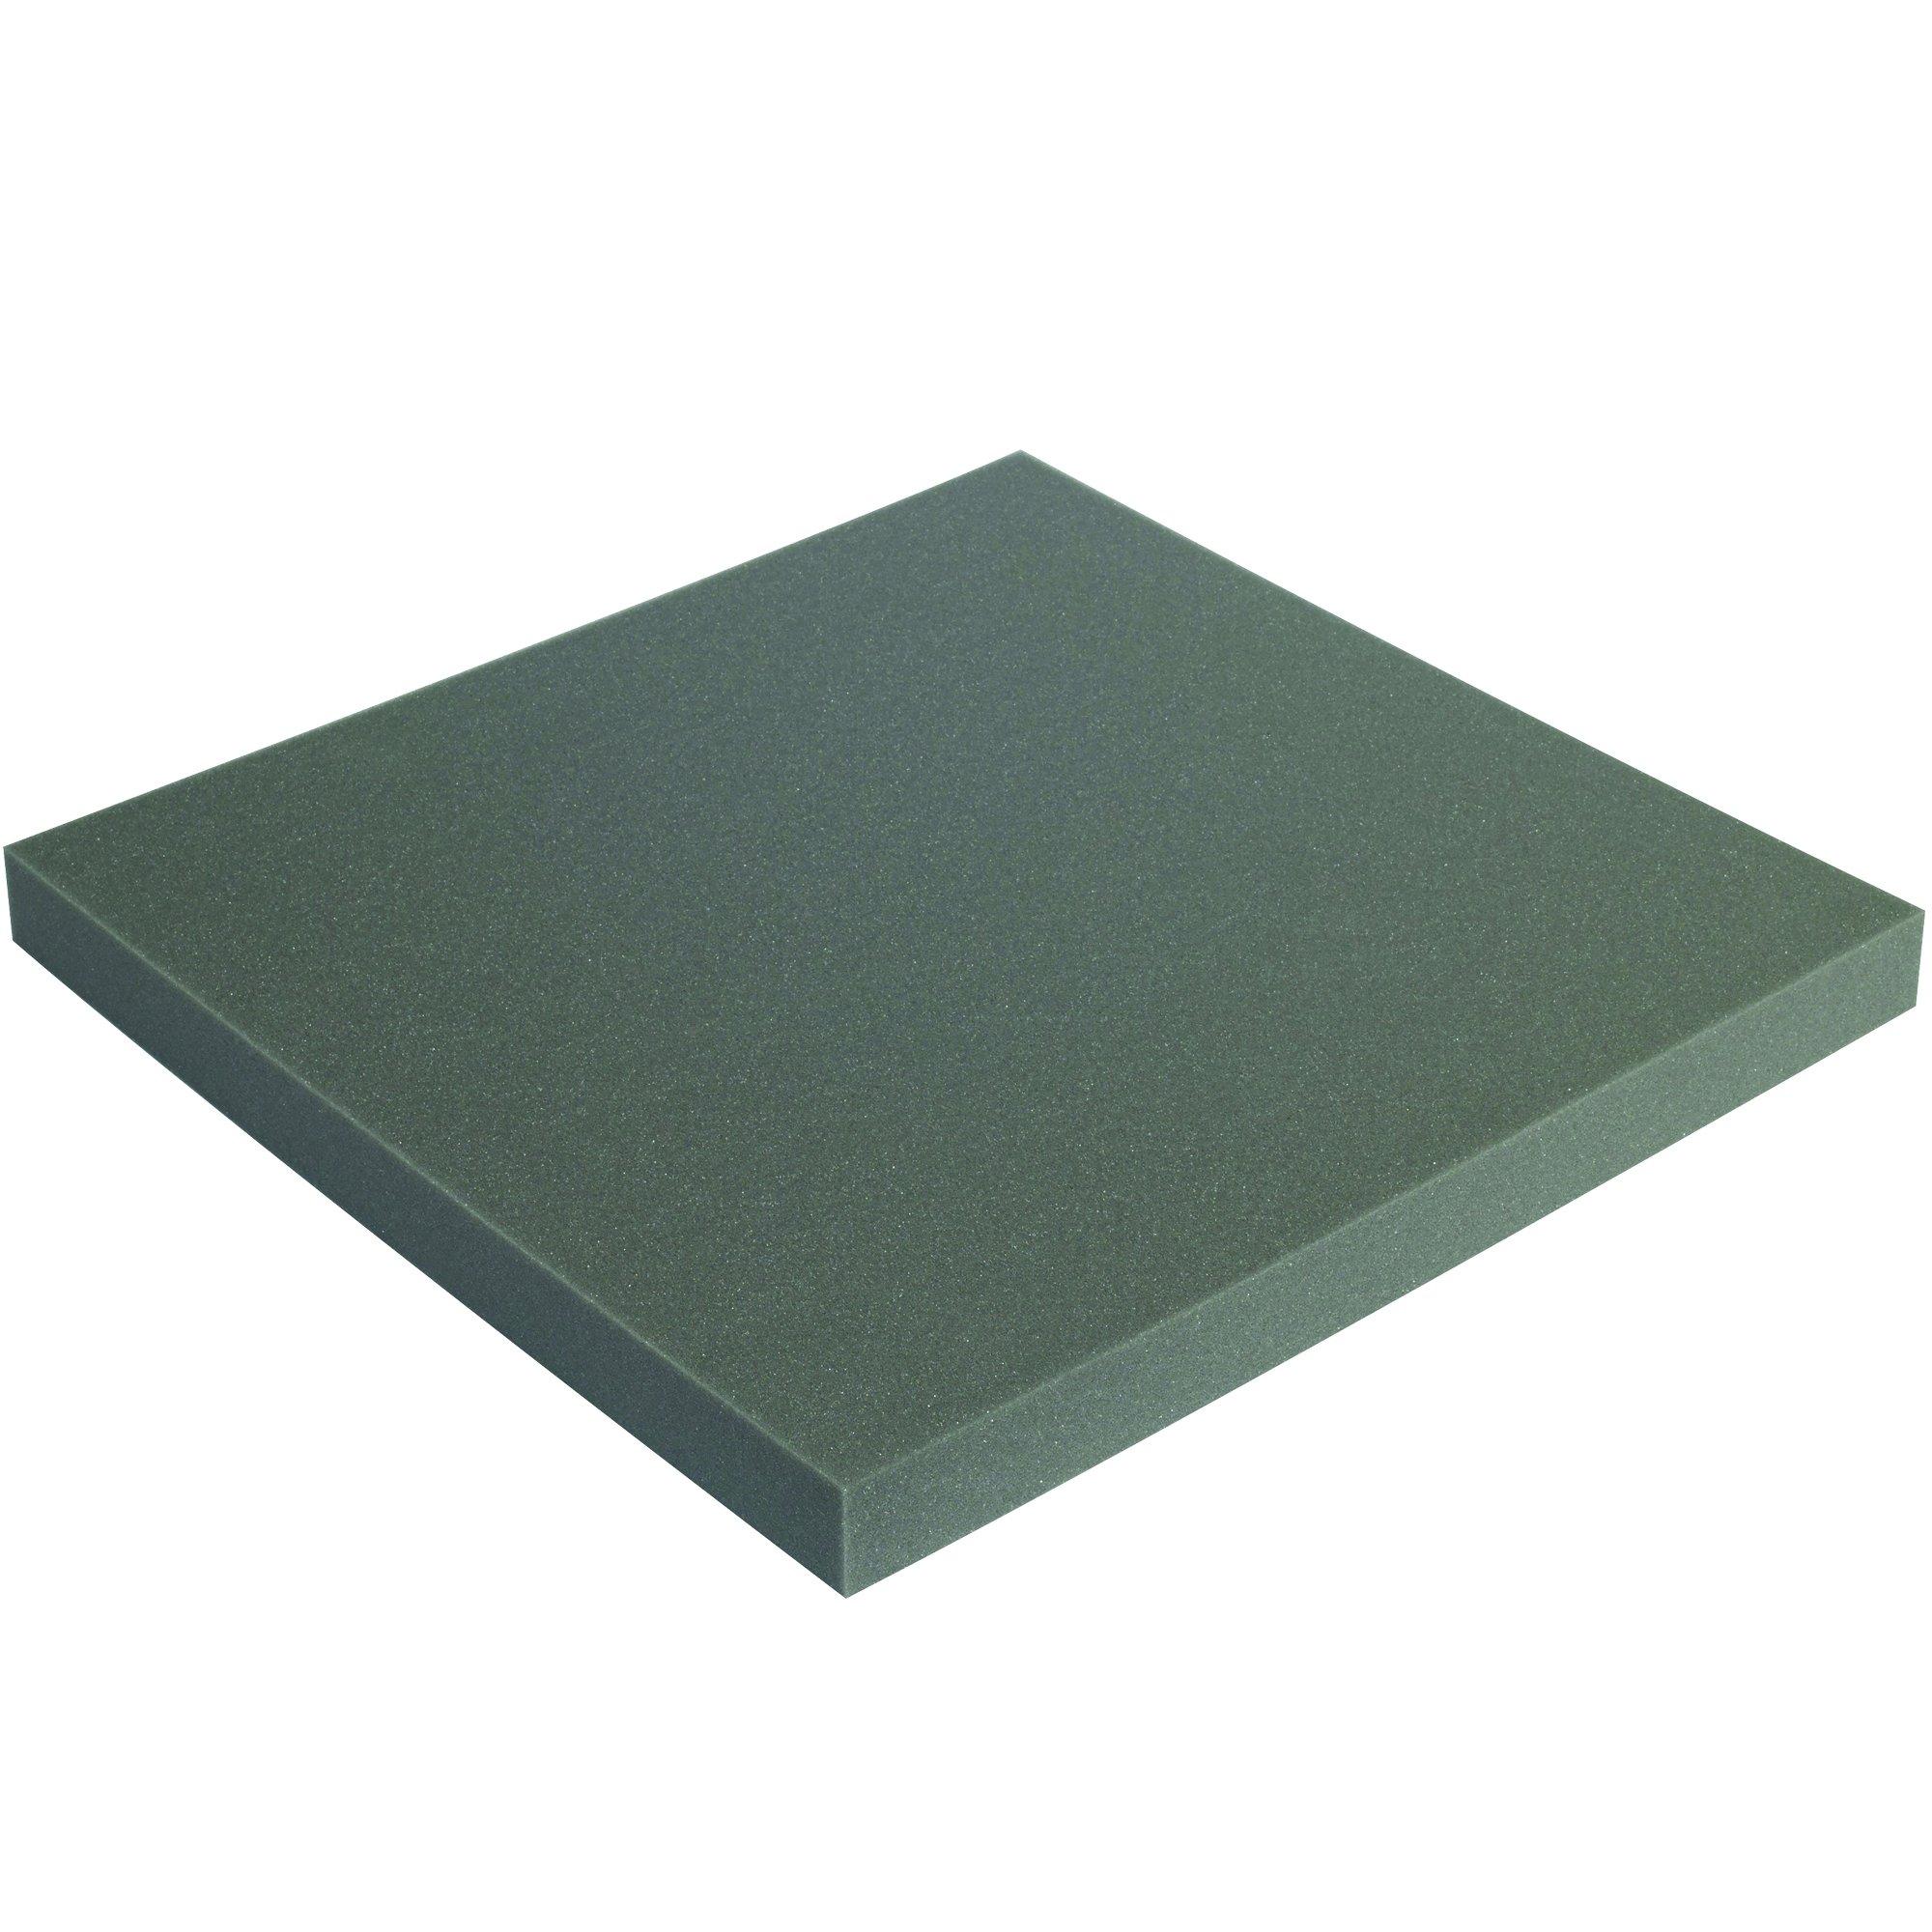 BOX USA FSC24242 Soft Foam Sheets, 2'' x 24'', Charcoal (Pack of 6) by BOX USA